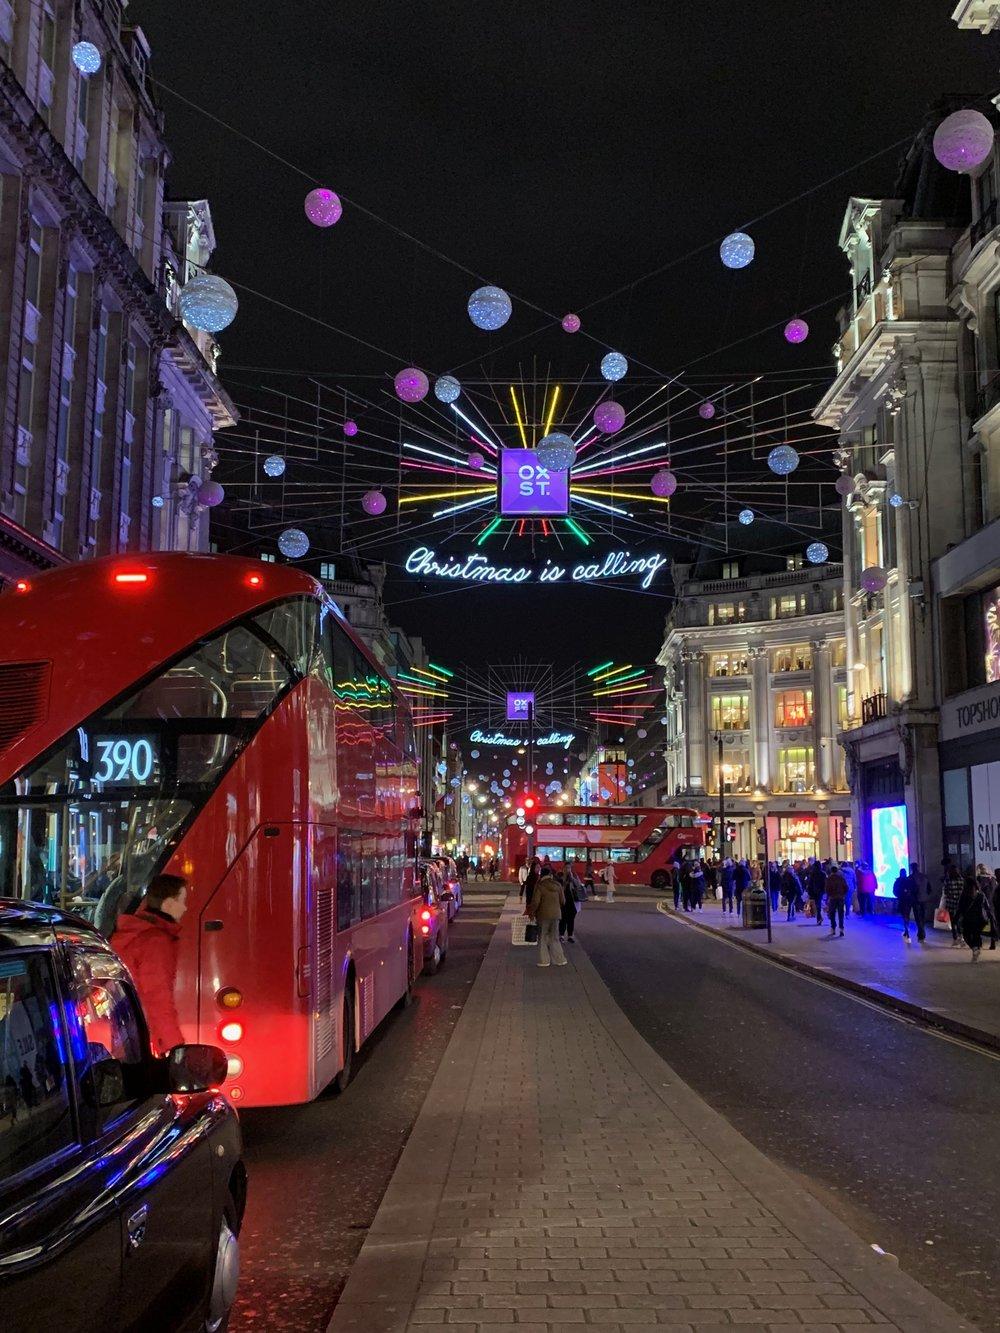 DECEMBER 10, 2018 • CHRISTMAS IS CALLING • 📍London, UK 🇬🇧